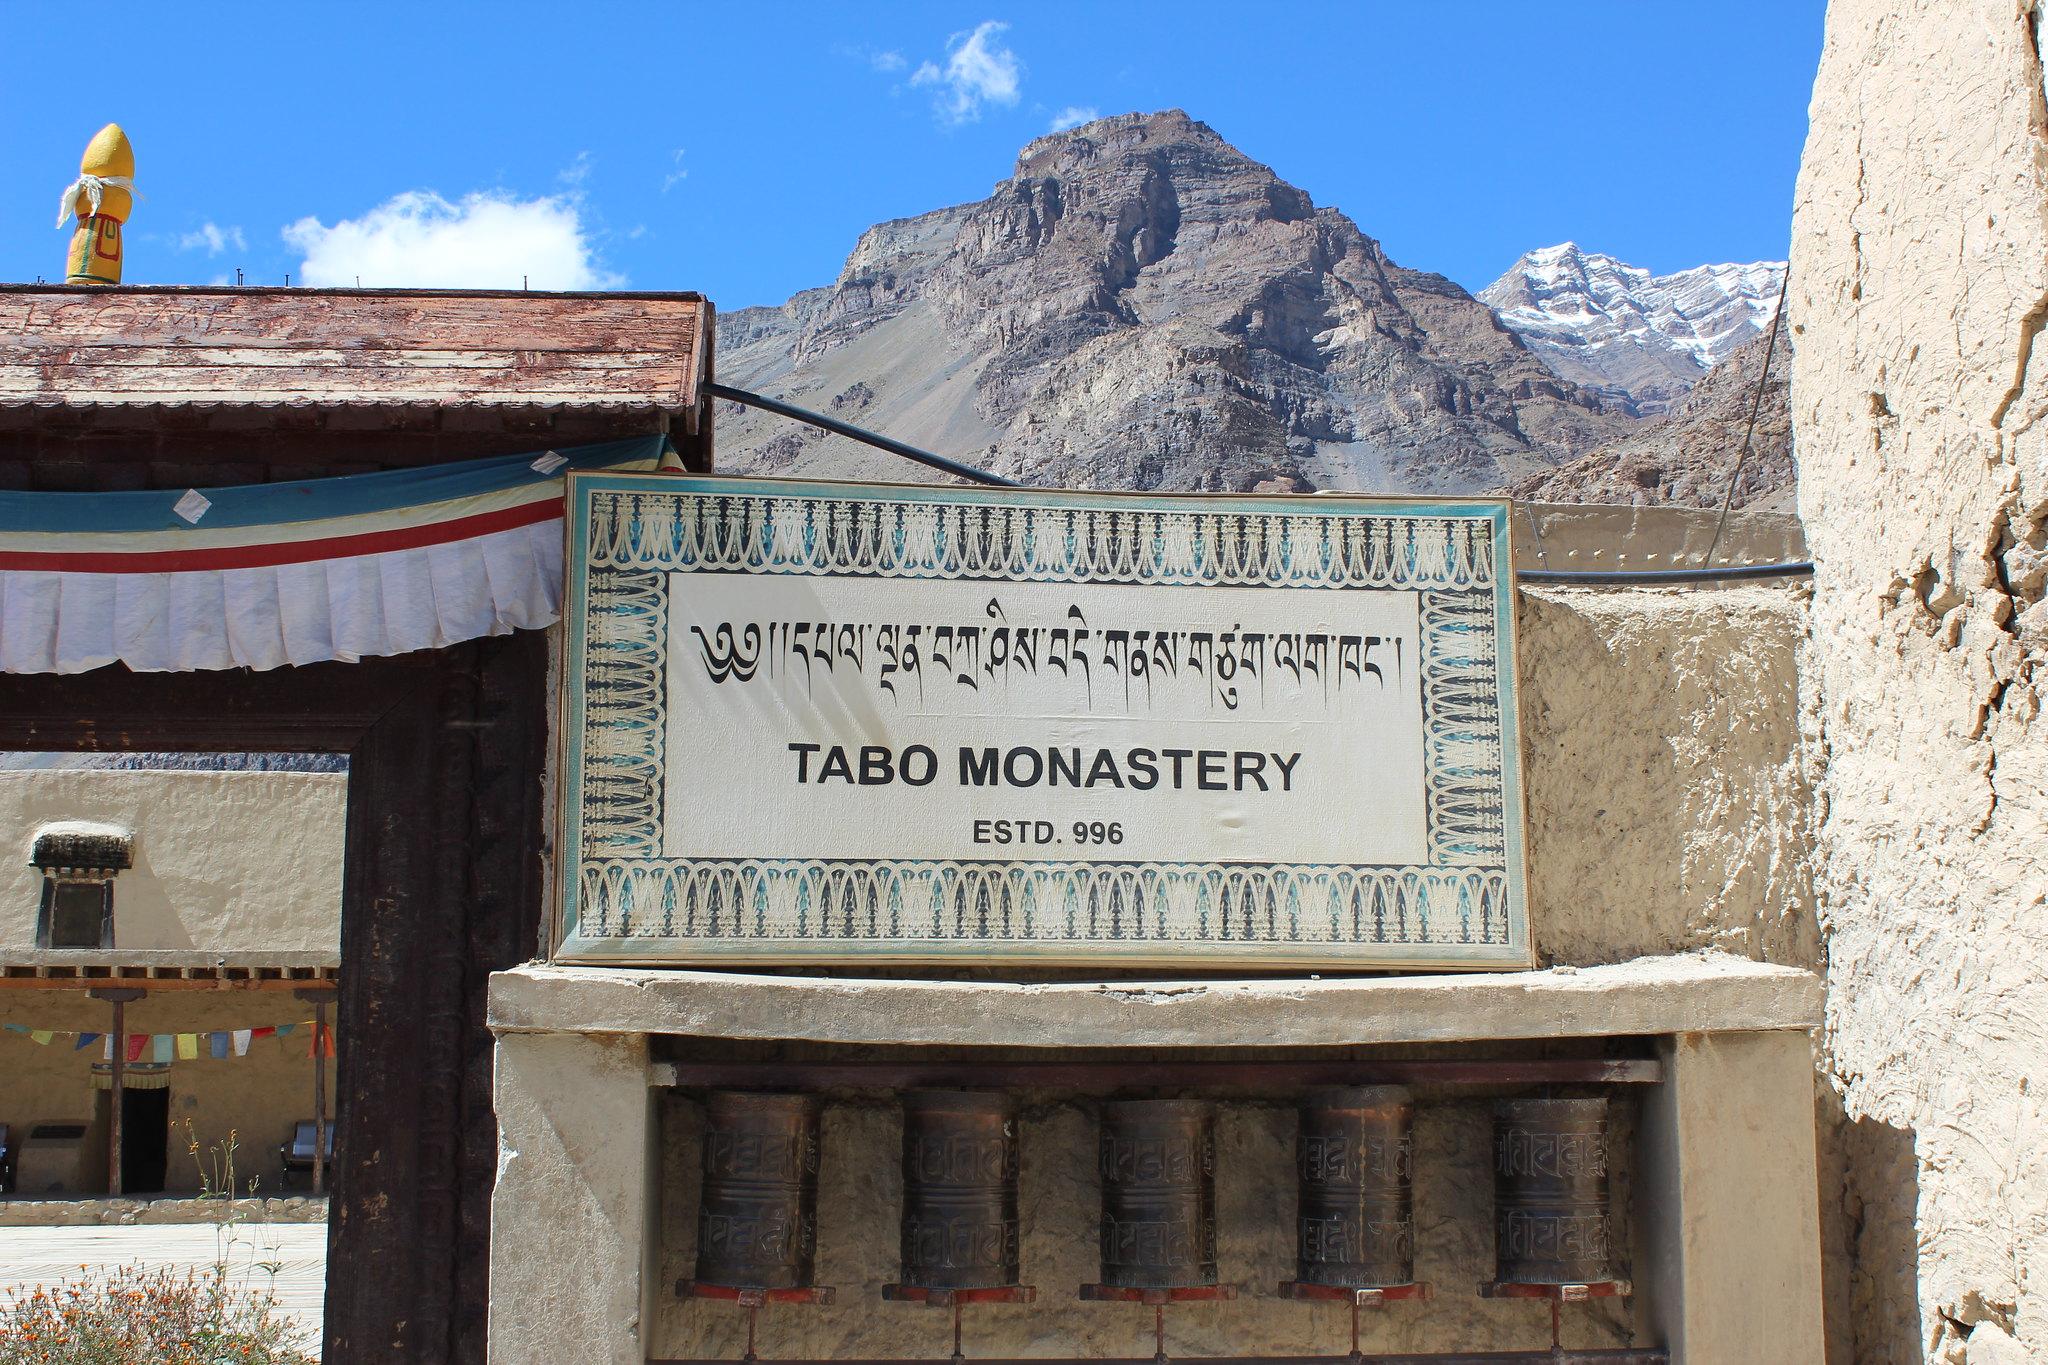 The entrance of Tabo Monastery